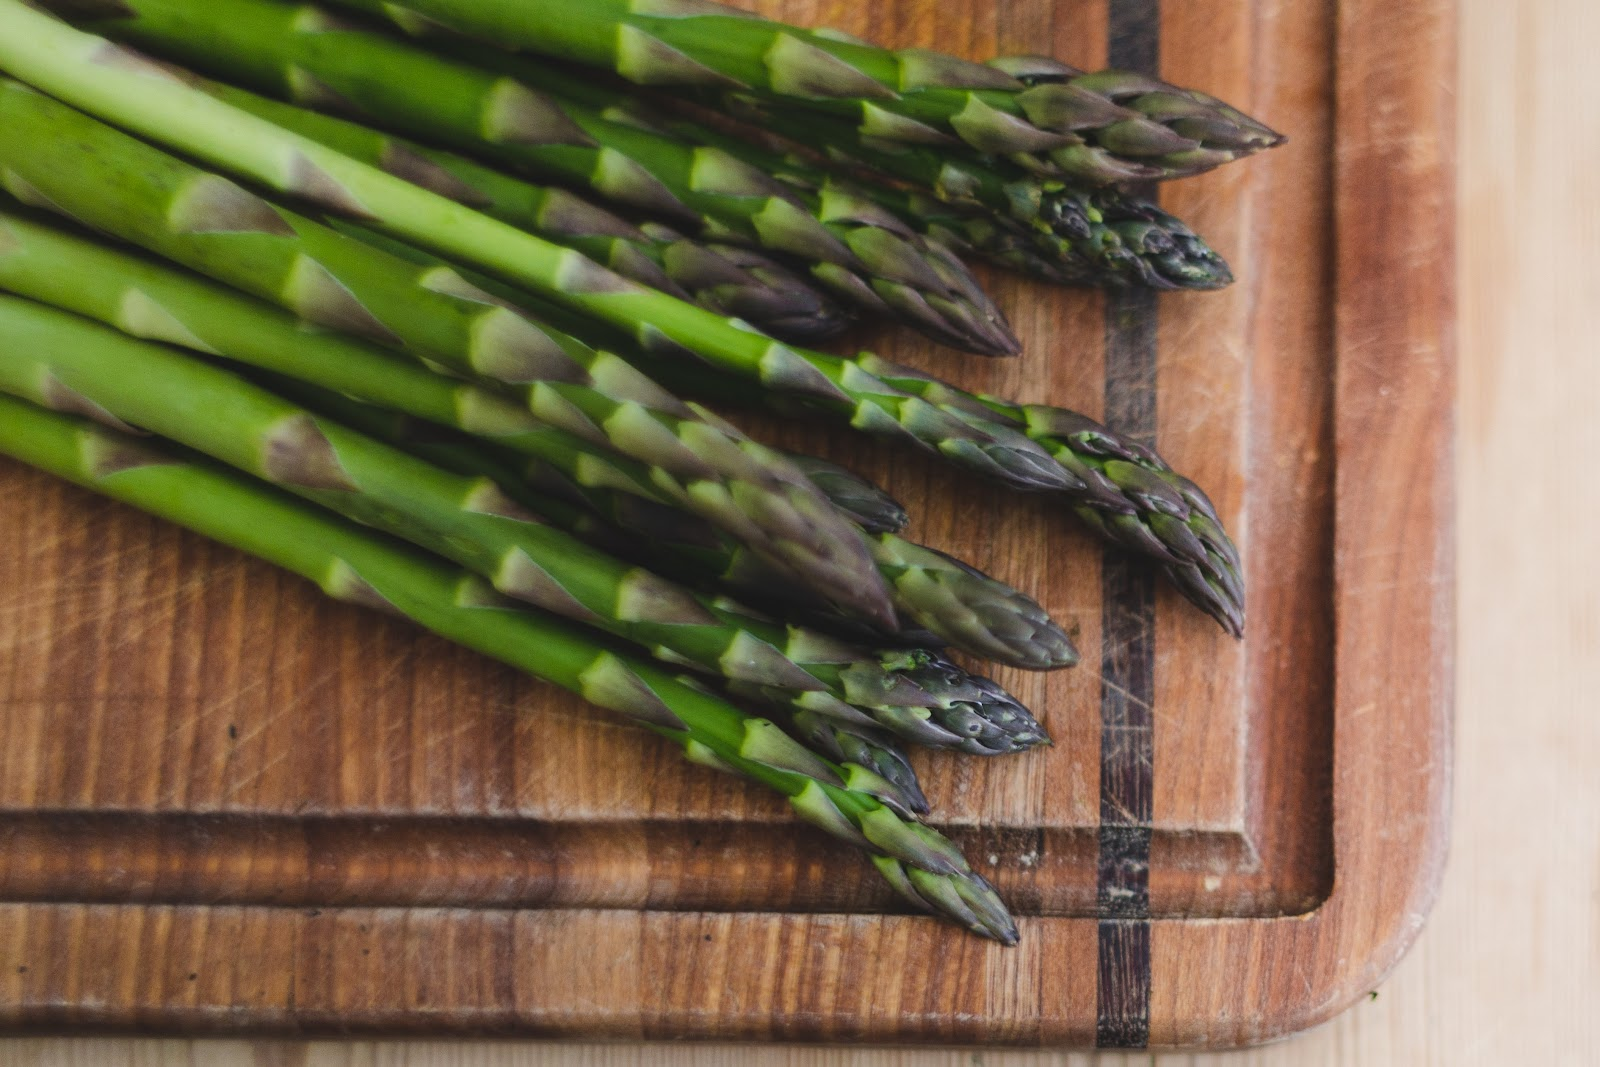 Asparagus on a cutting board.